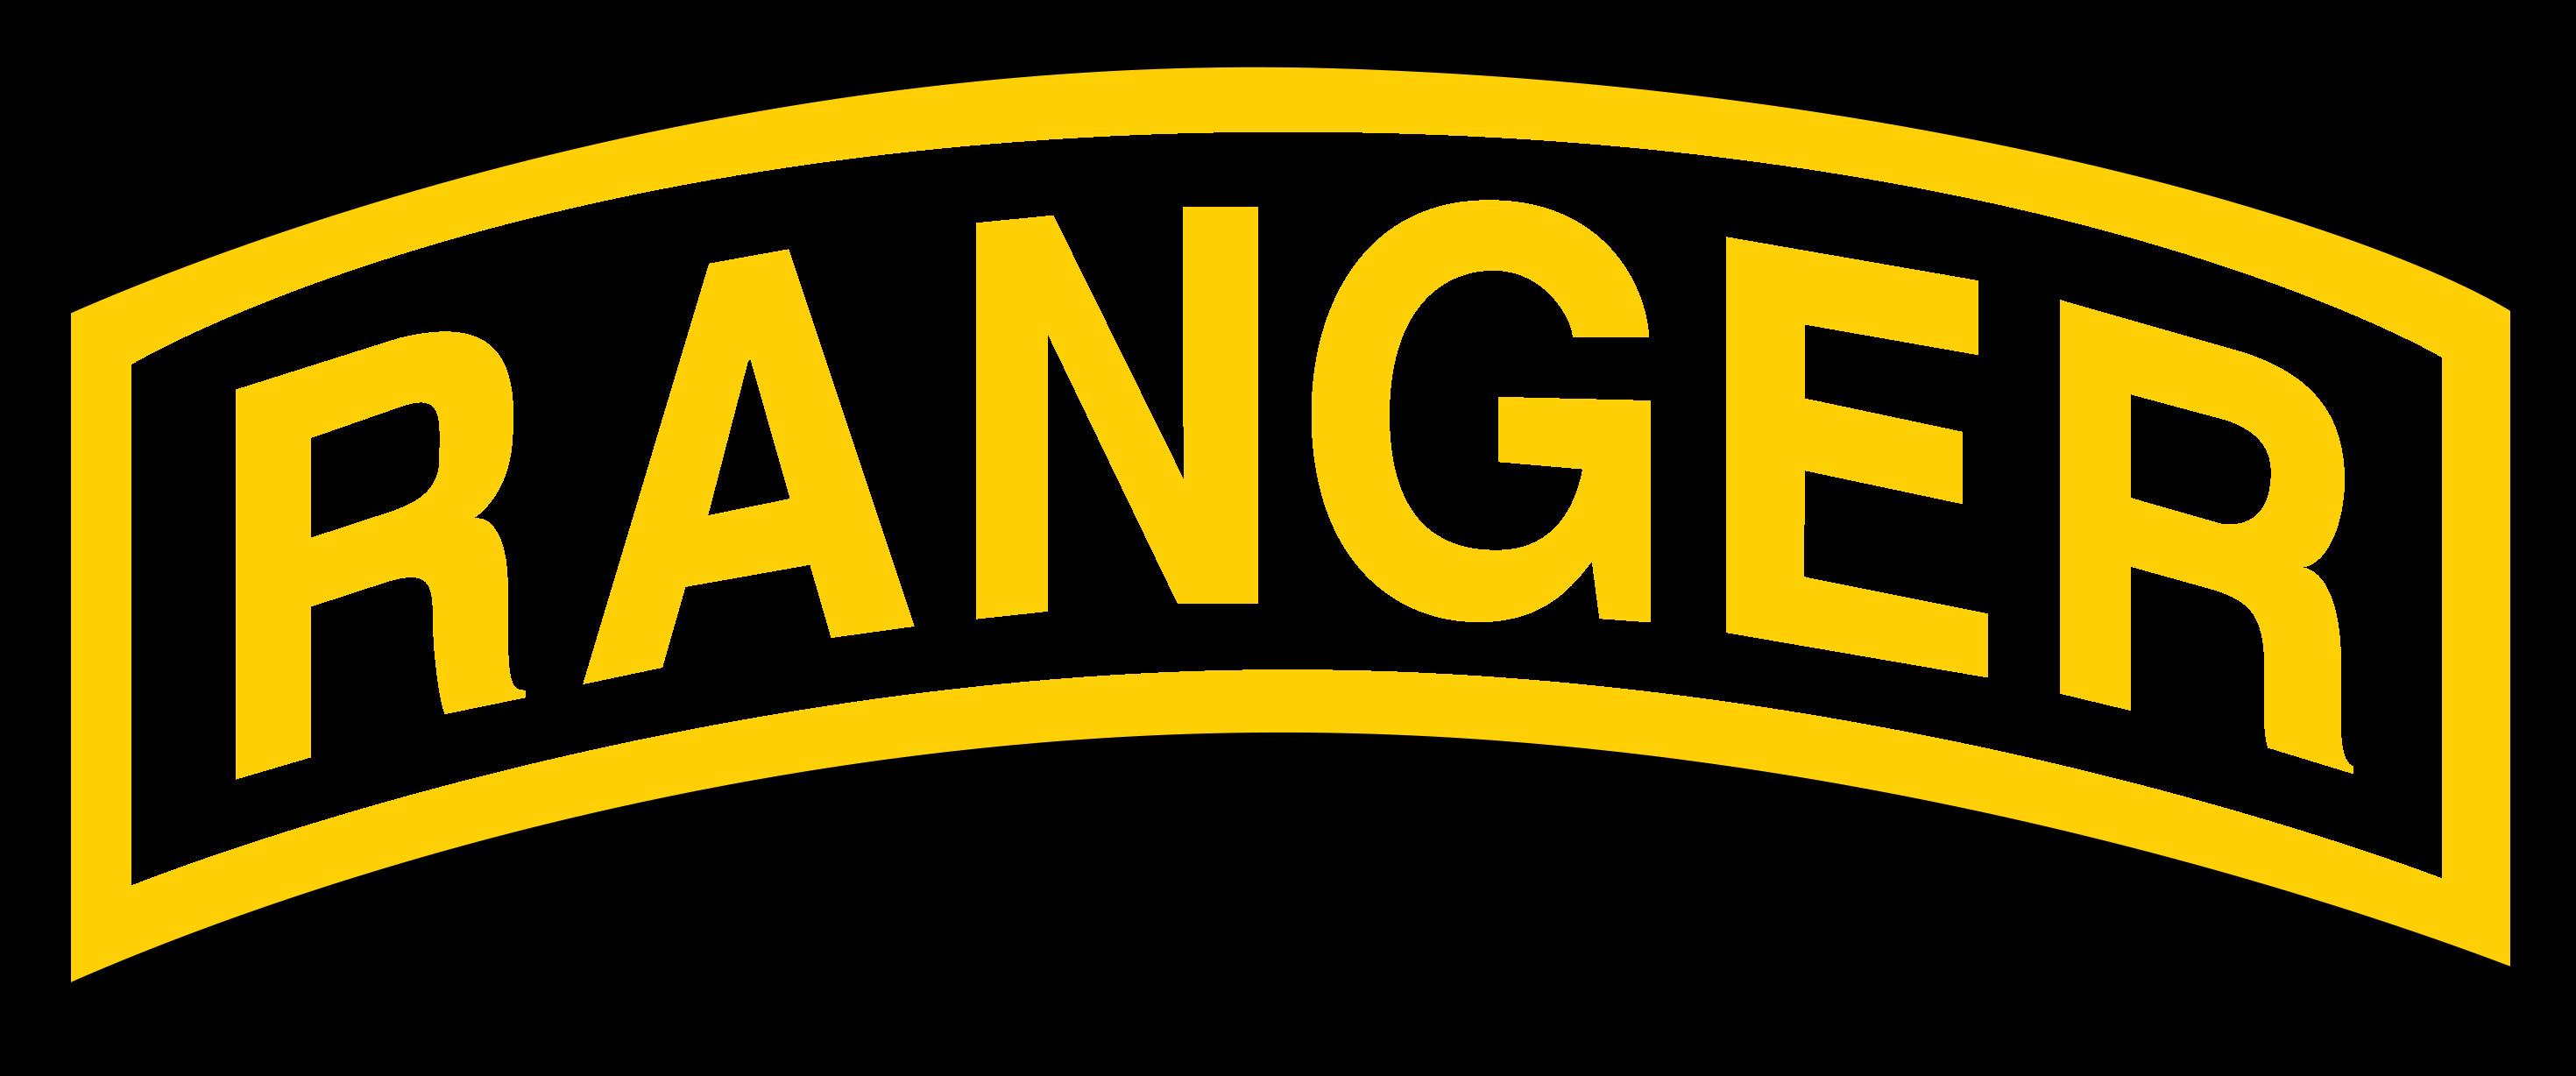 Us army rangers Logos.